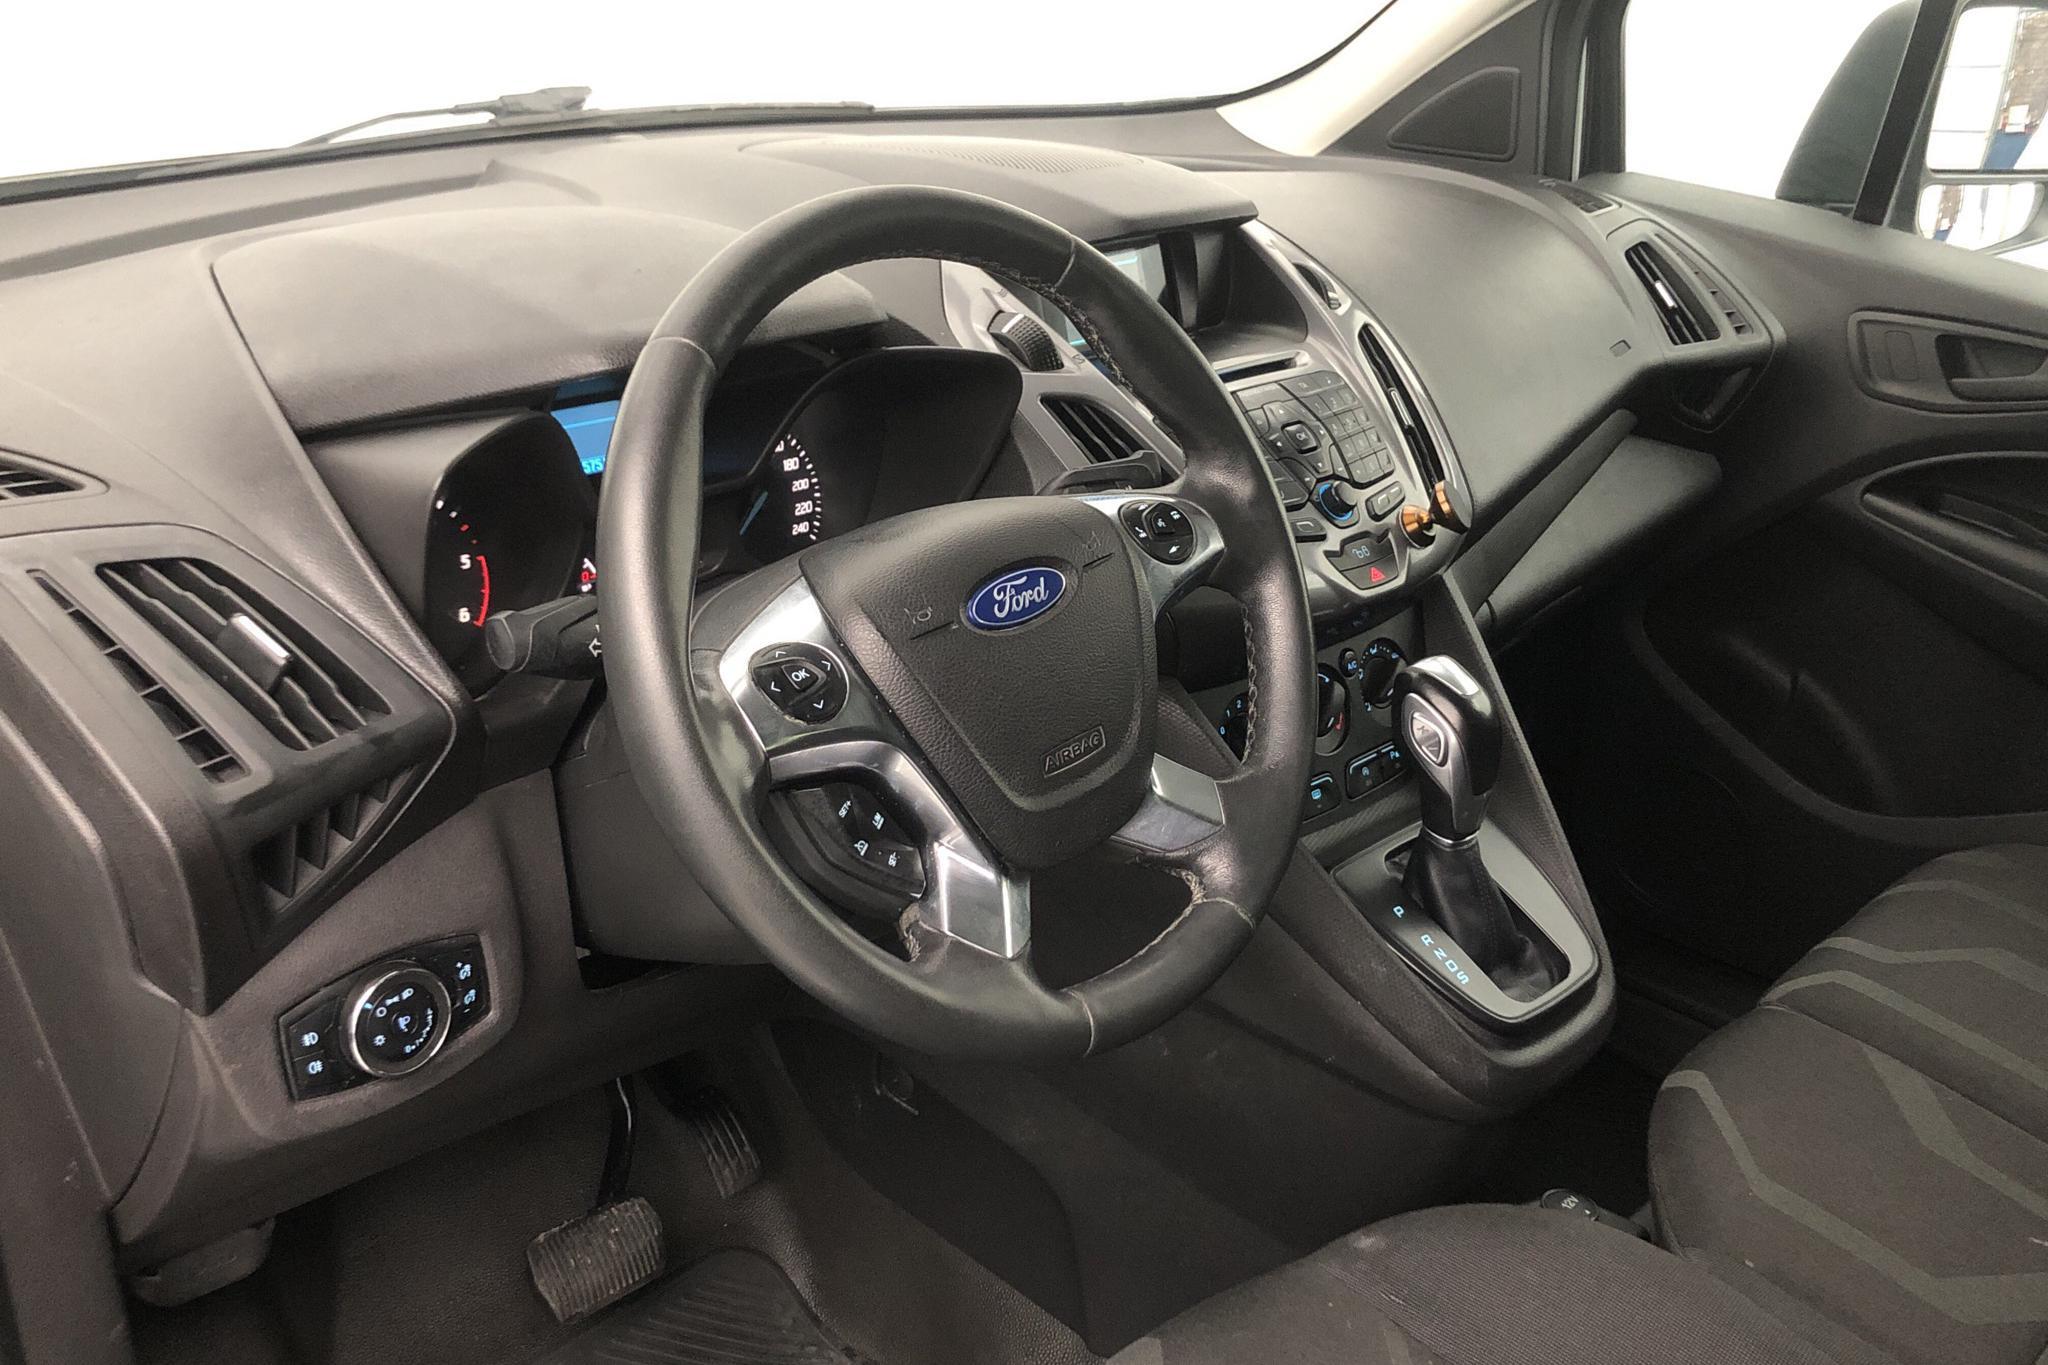 Ford Transit Connect 1.5 TDCi (120hk) - 11 157 mil - Automat - grå - 2016